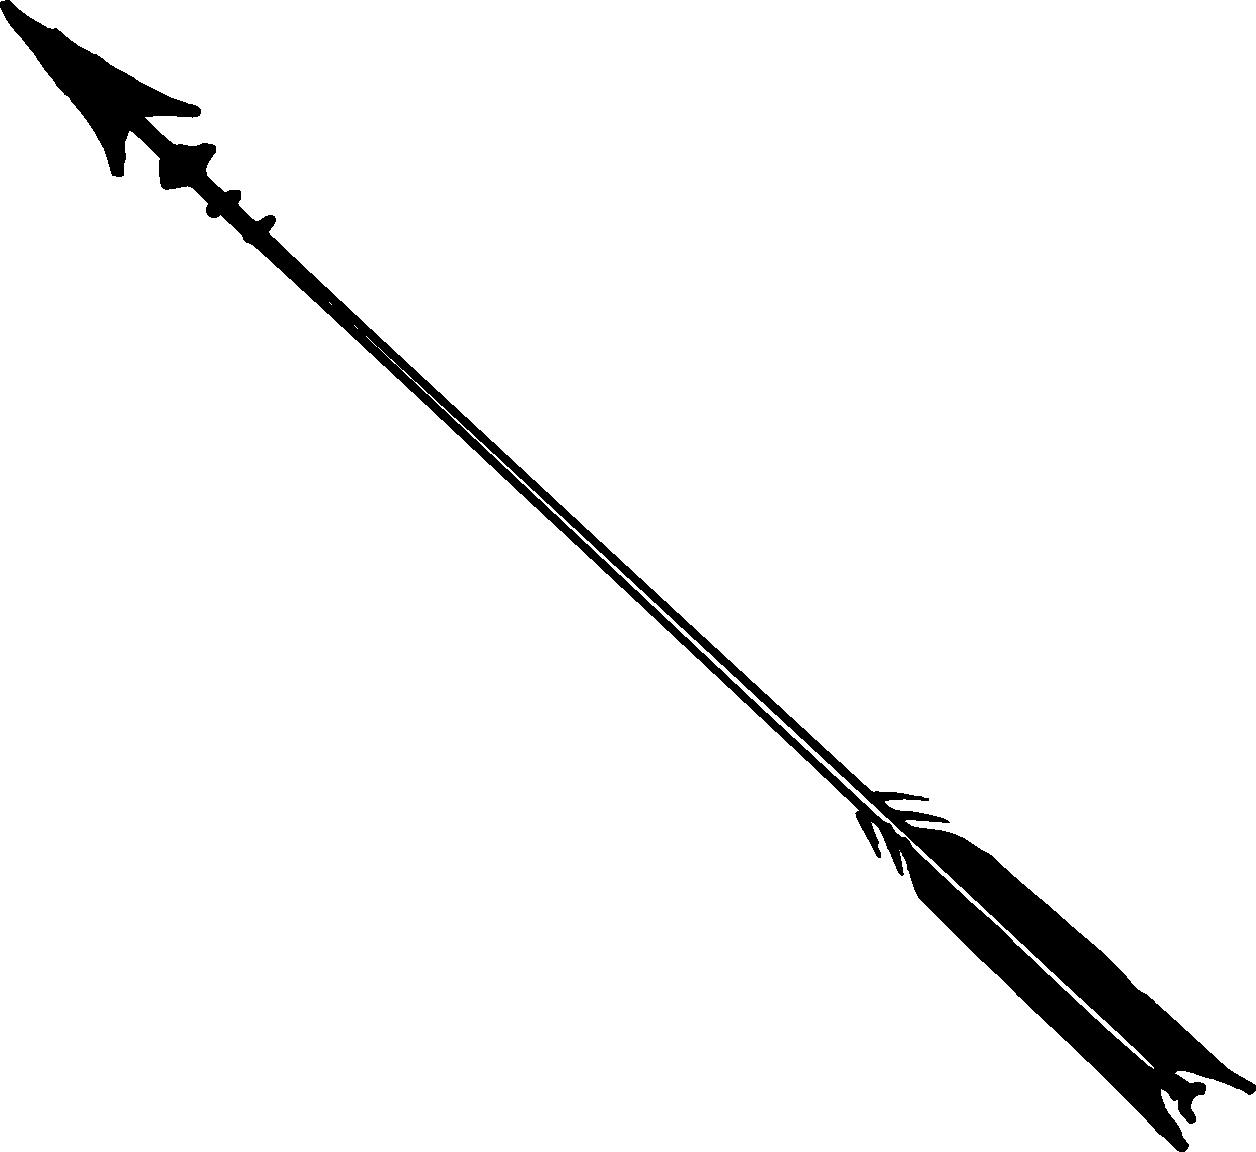 10 Bow Arrow Vector (SVG, PNG Transparent)   OnlyGFX.com